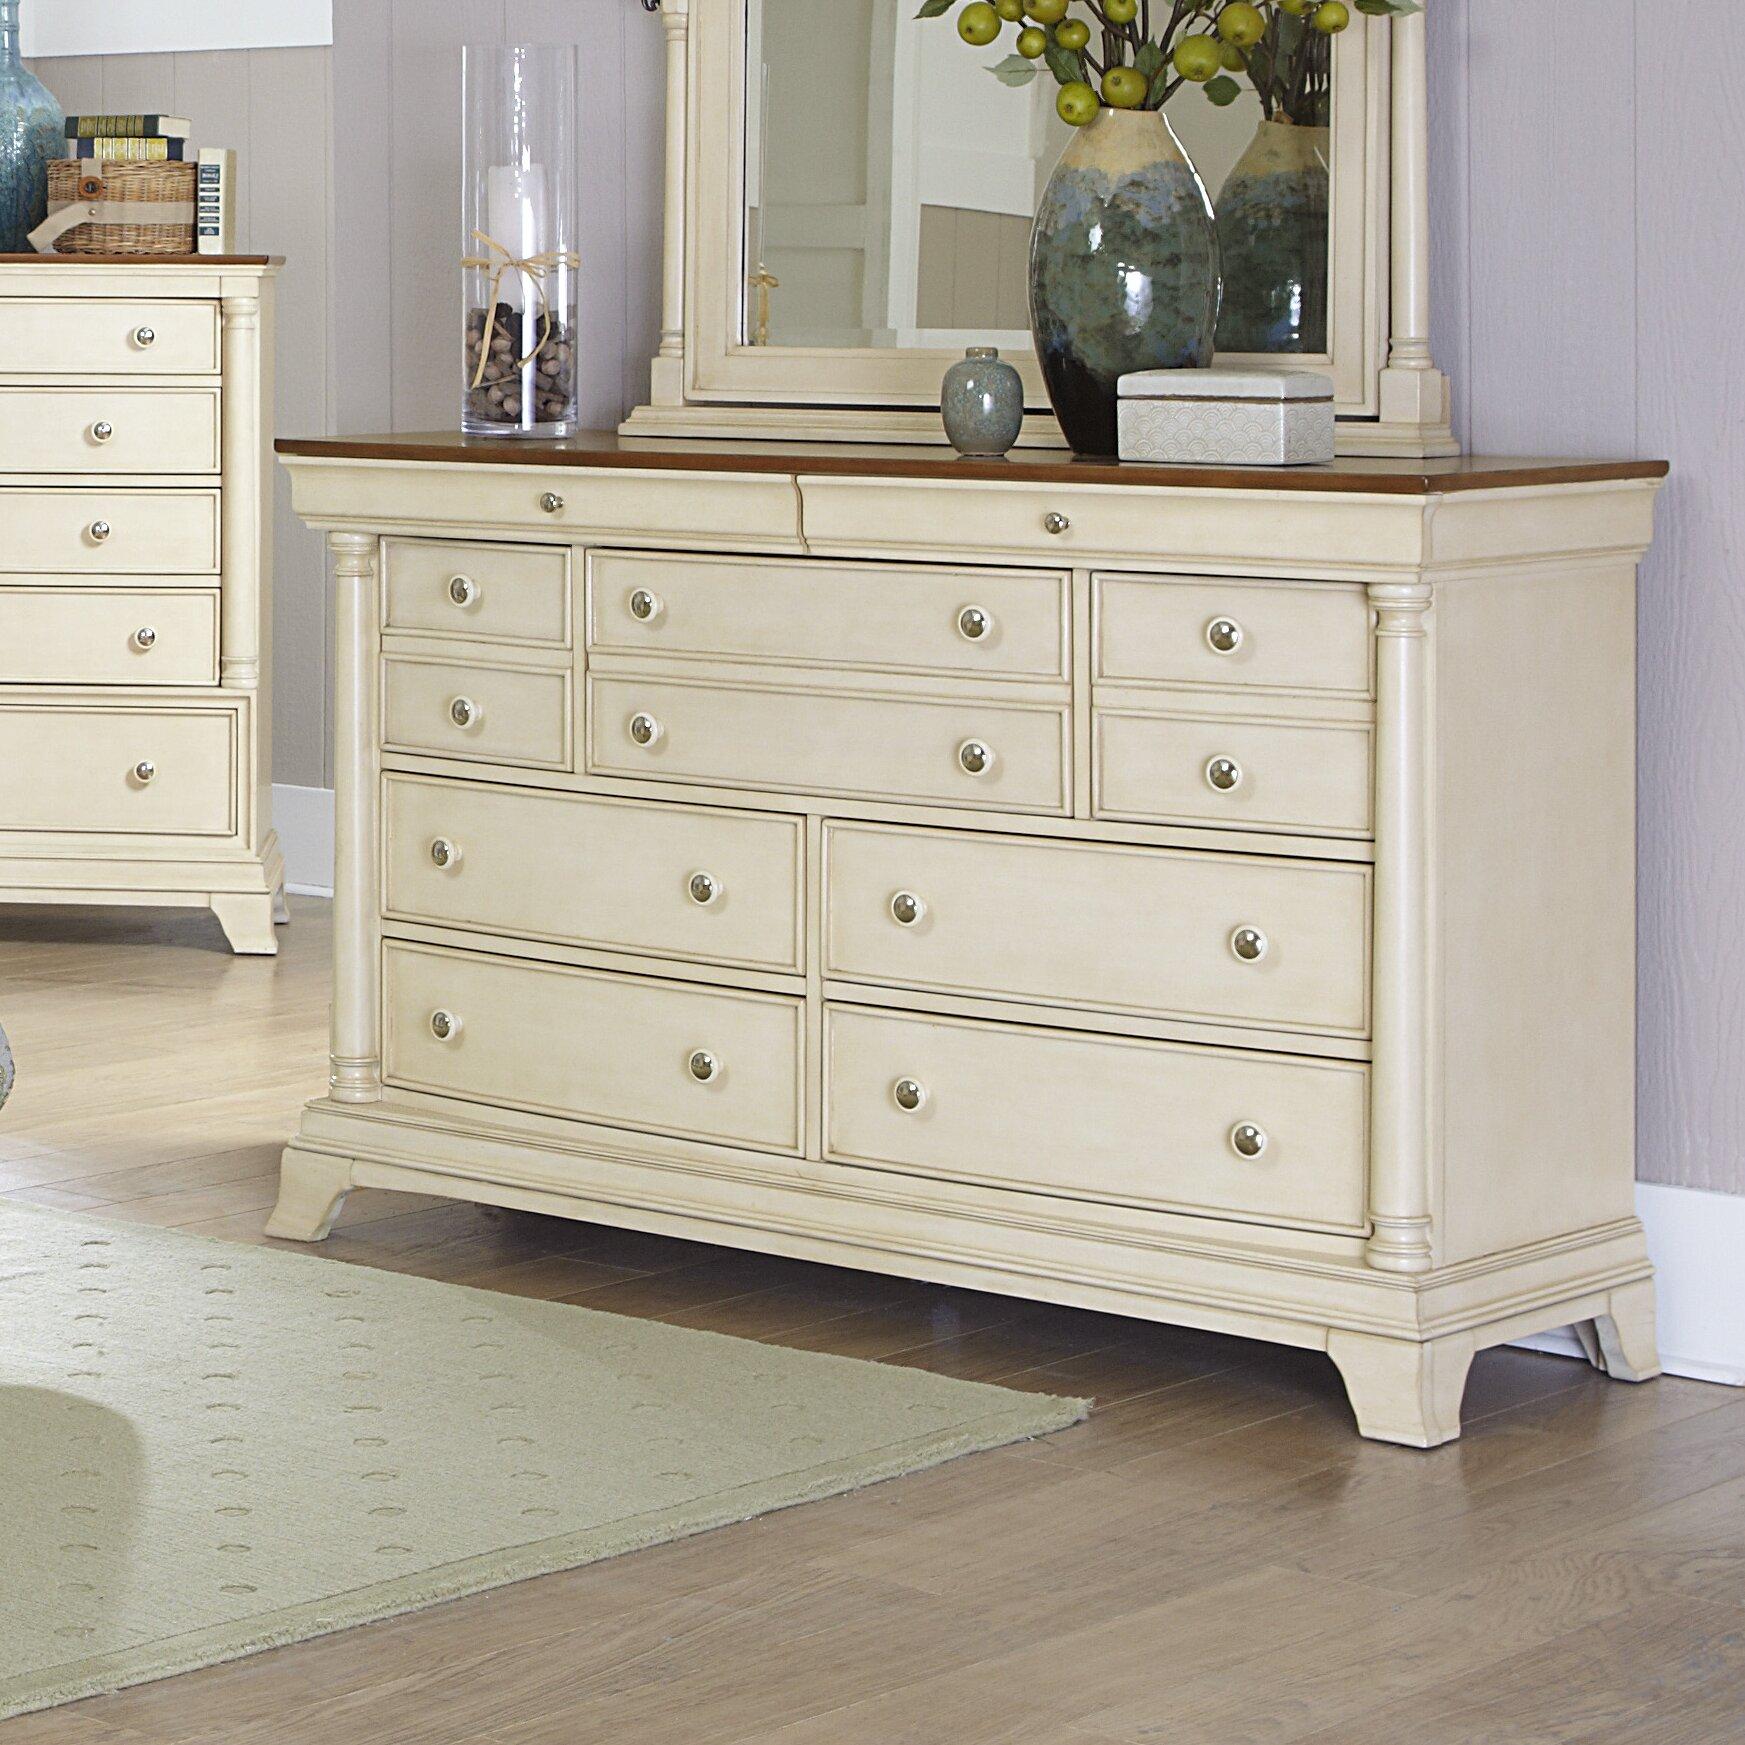 Woodhaven Hill Inglewood II 7 Drawer Dresser & Reviews